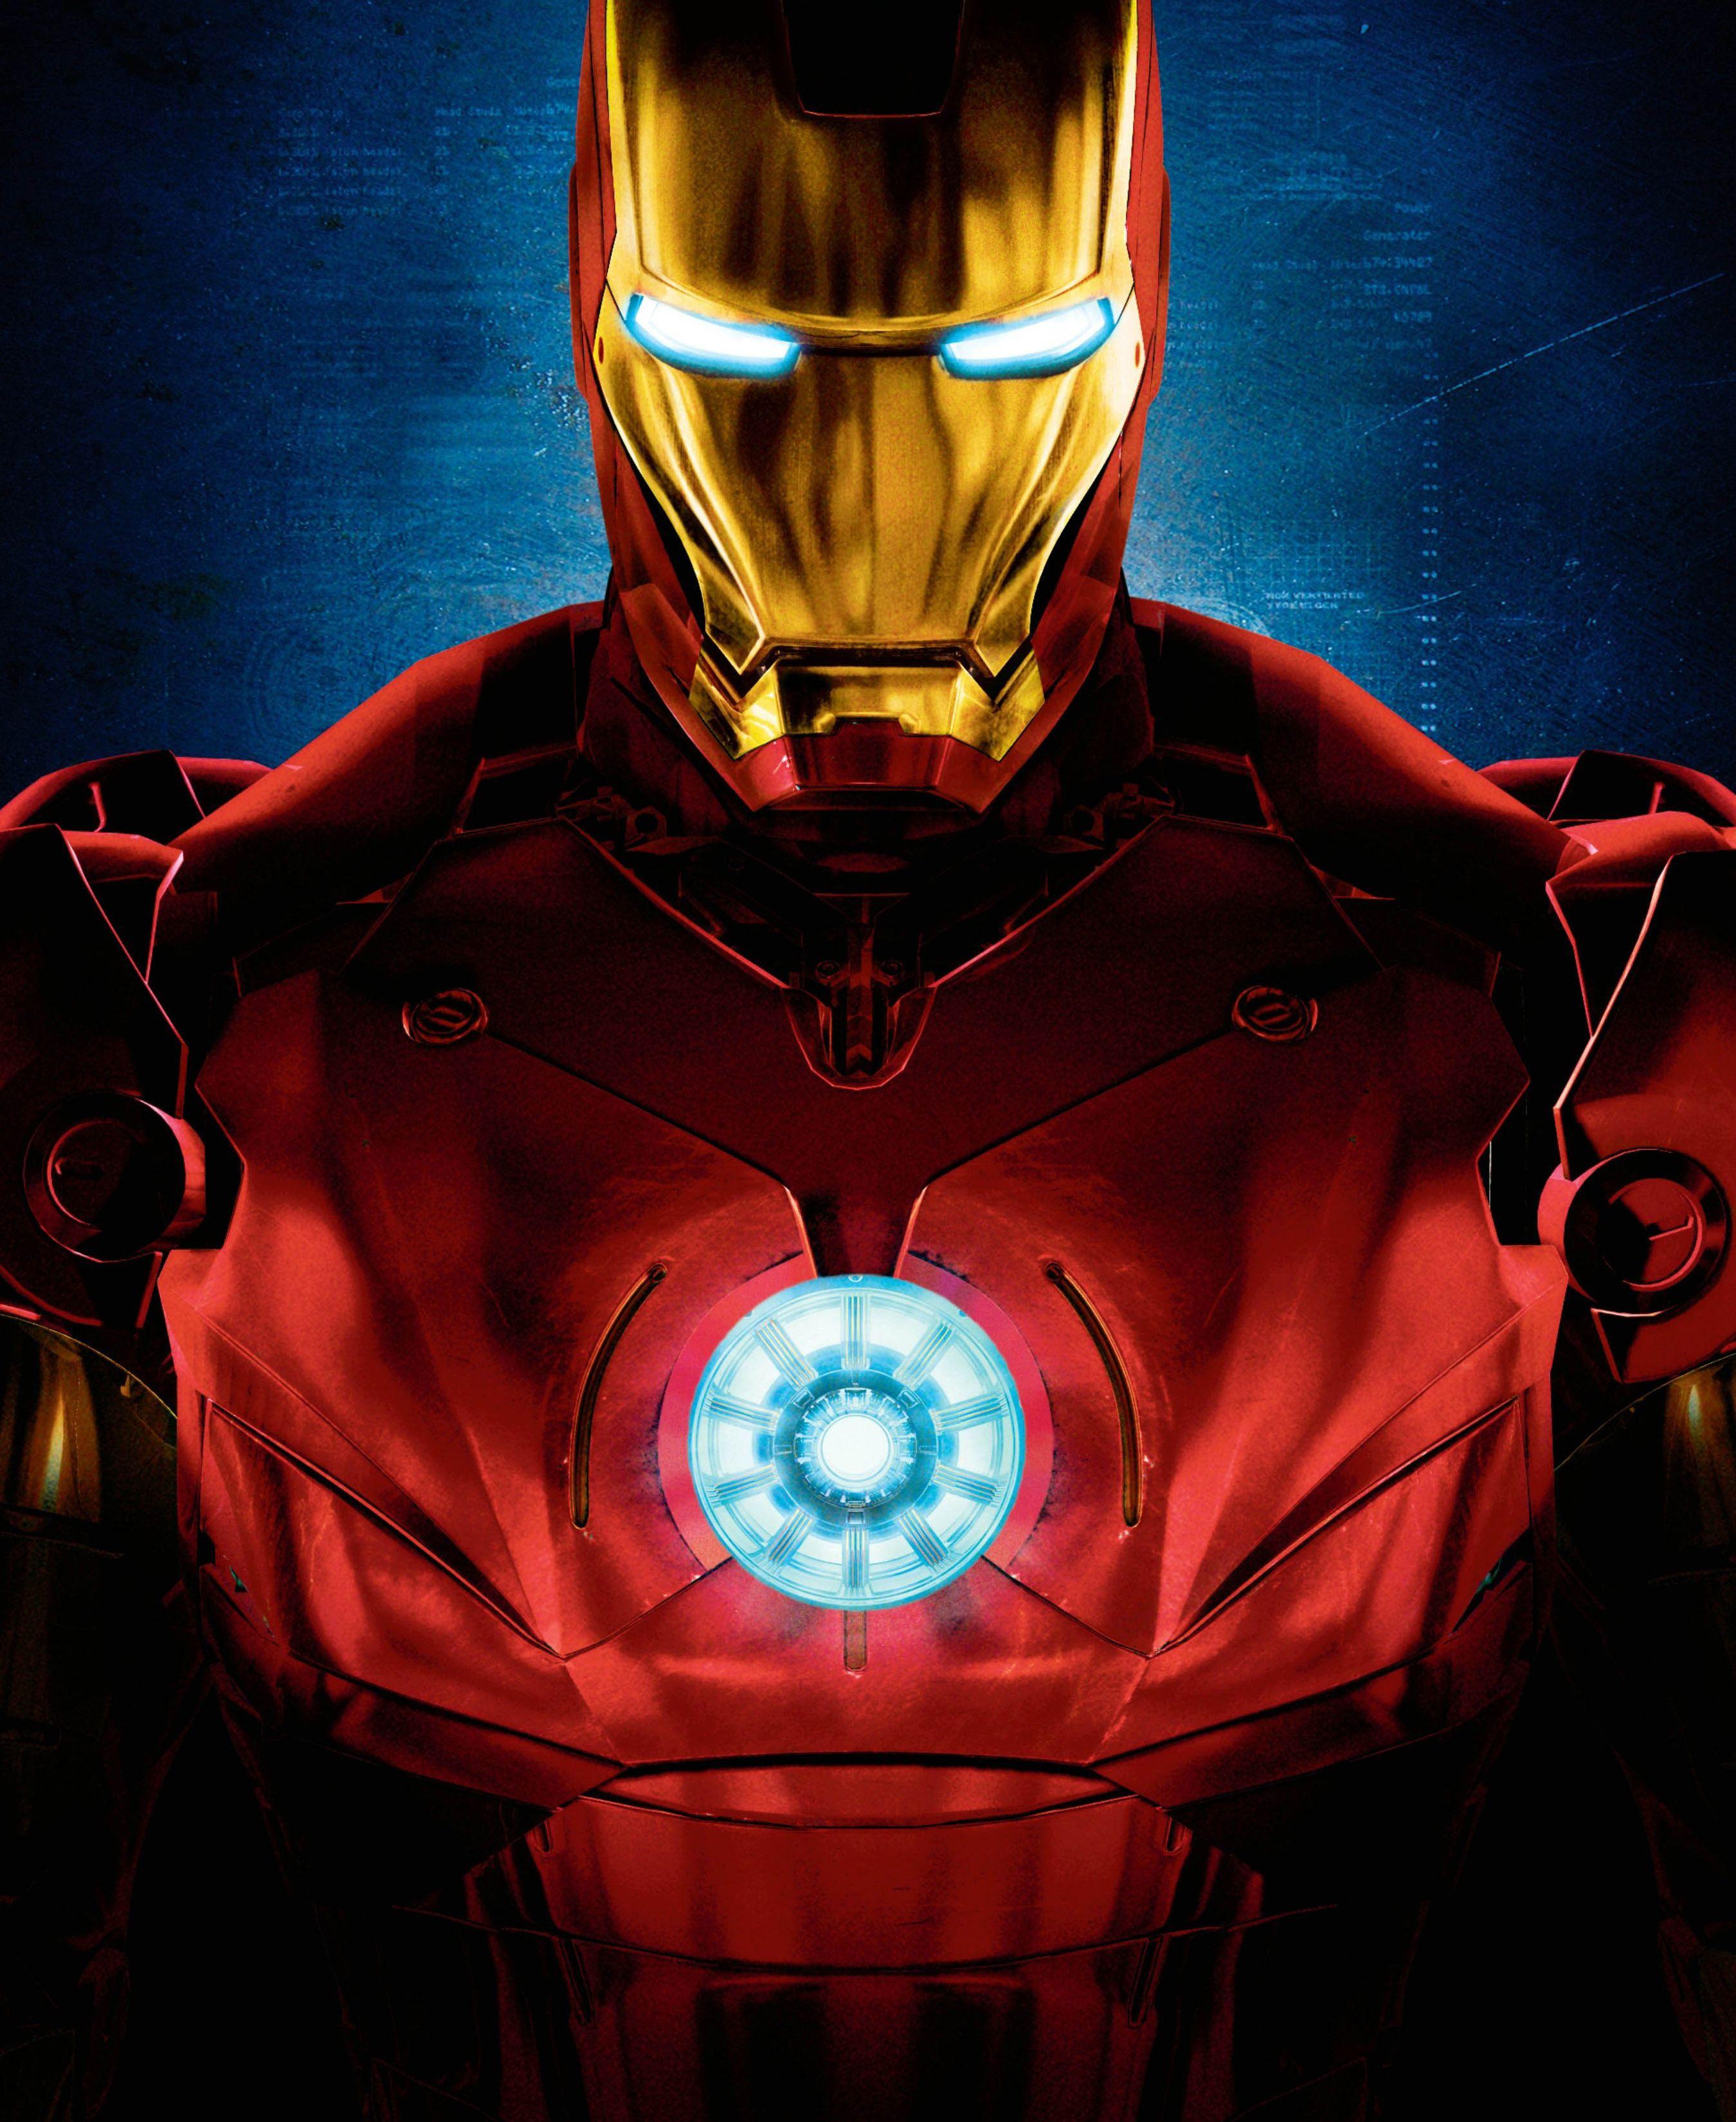 Iron Man Iron Man Wallpaper Iron Man Iron Man Hd Wallpaper